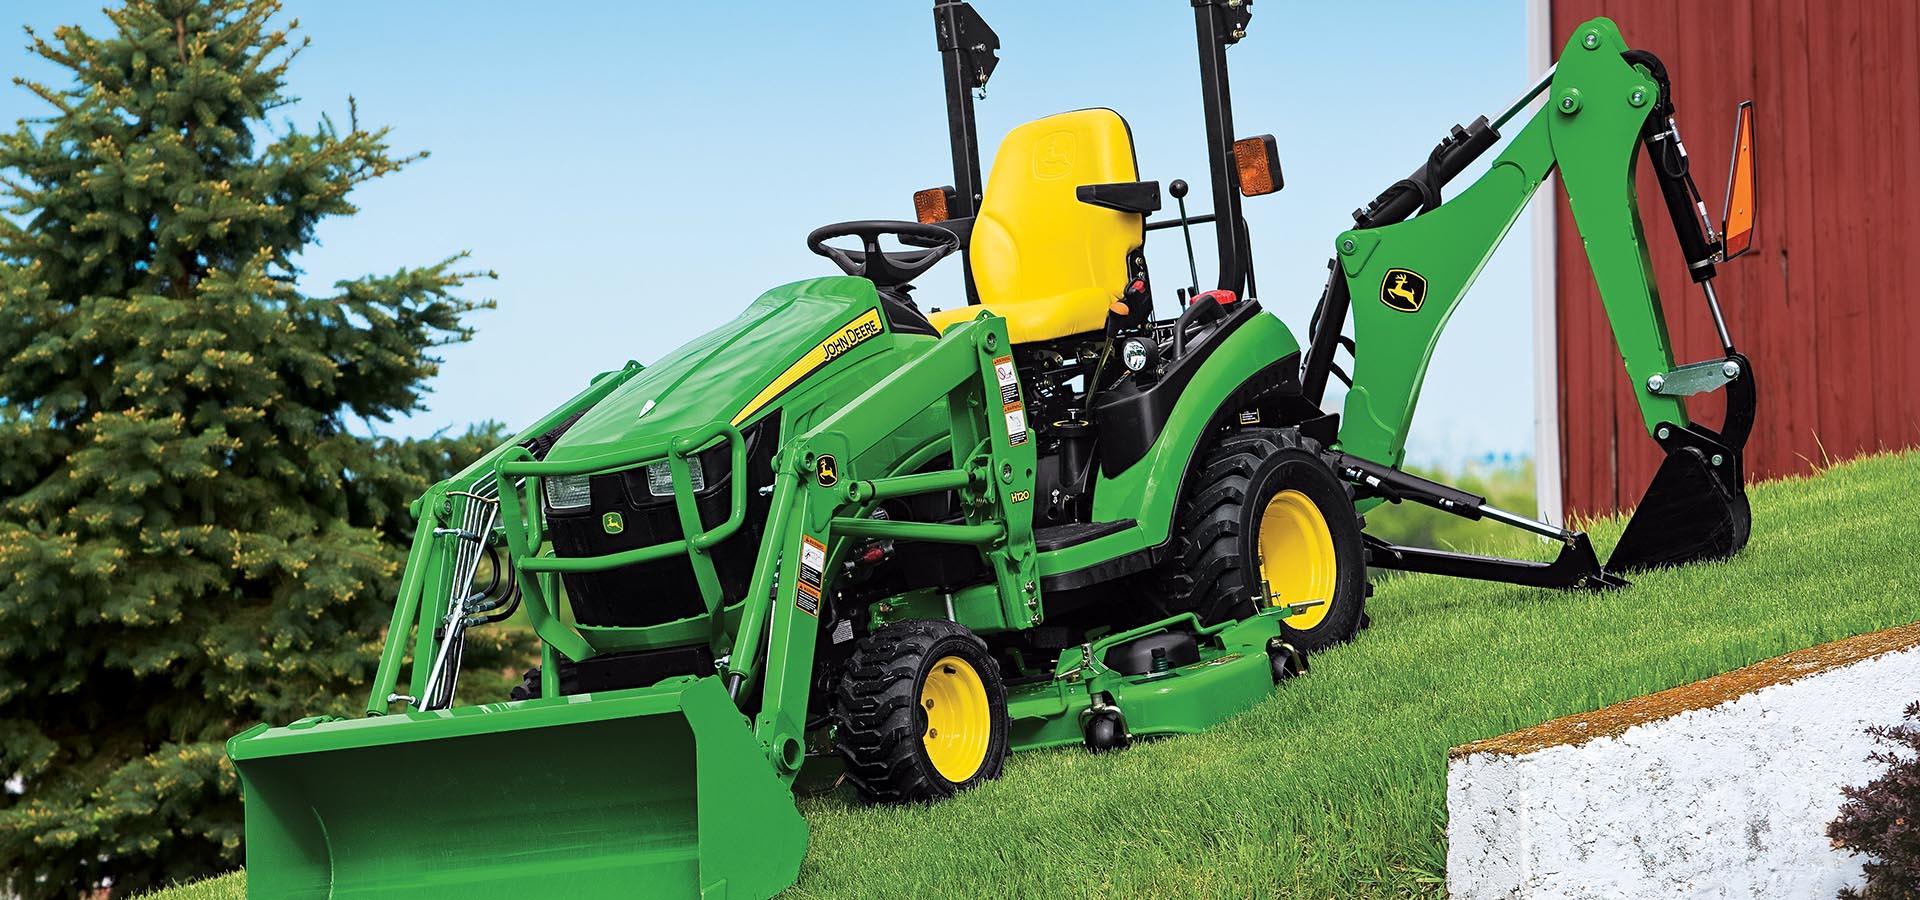 John Deere Tractors for Sale | Landscape Supply, Co.